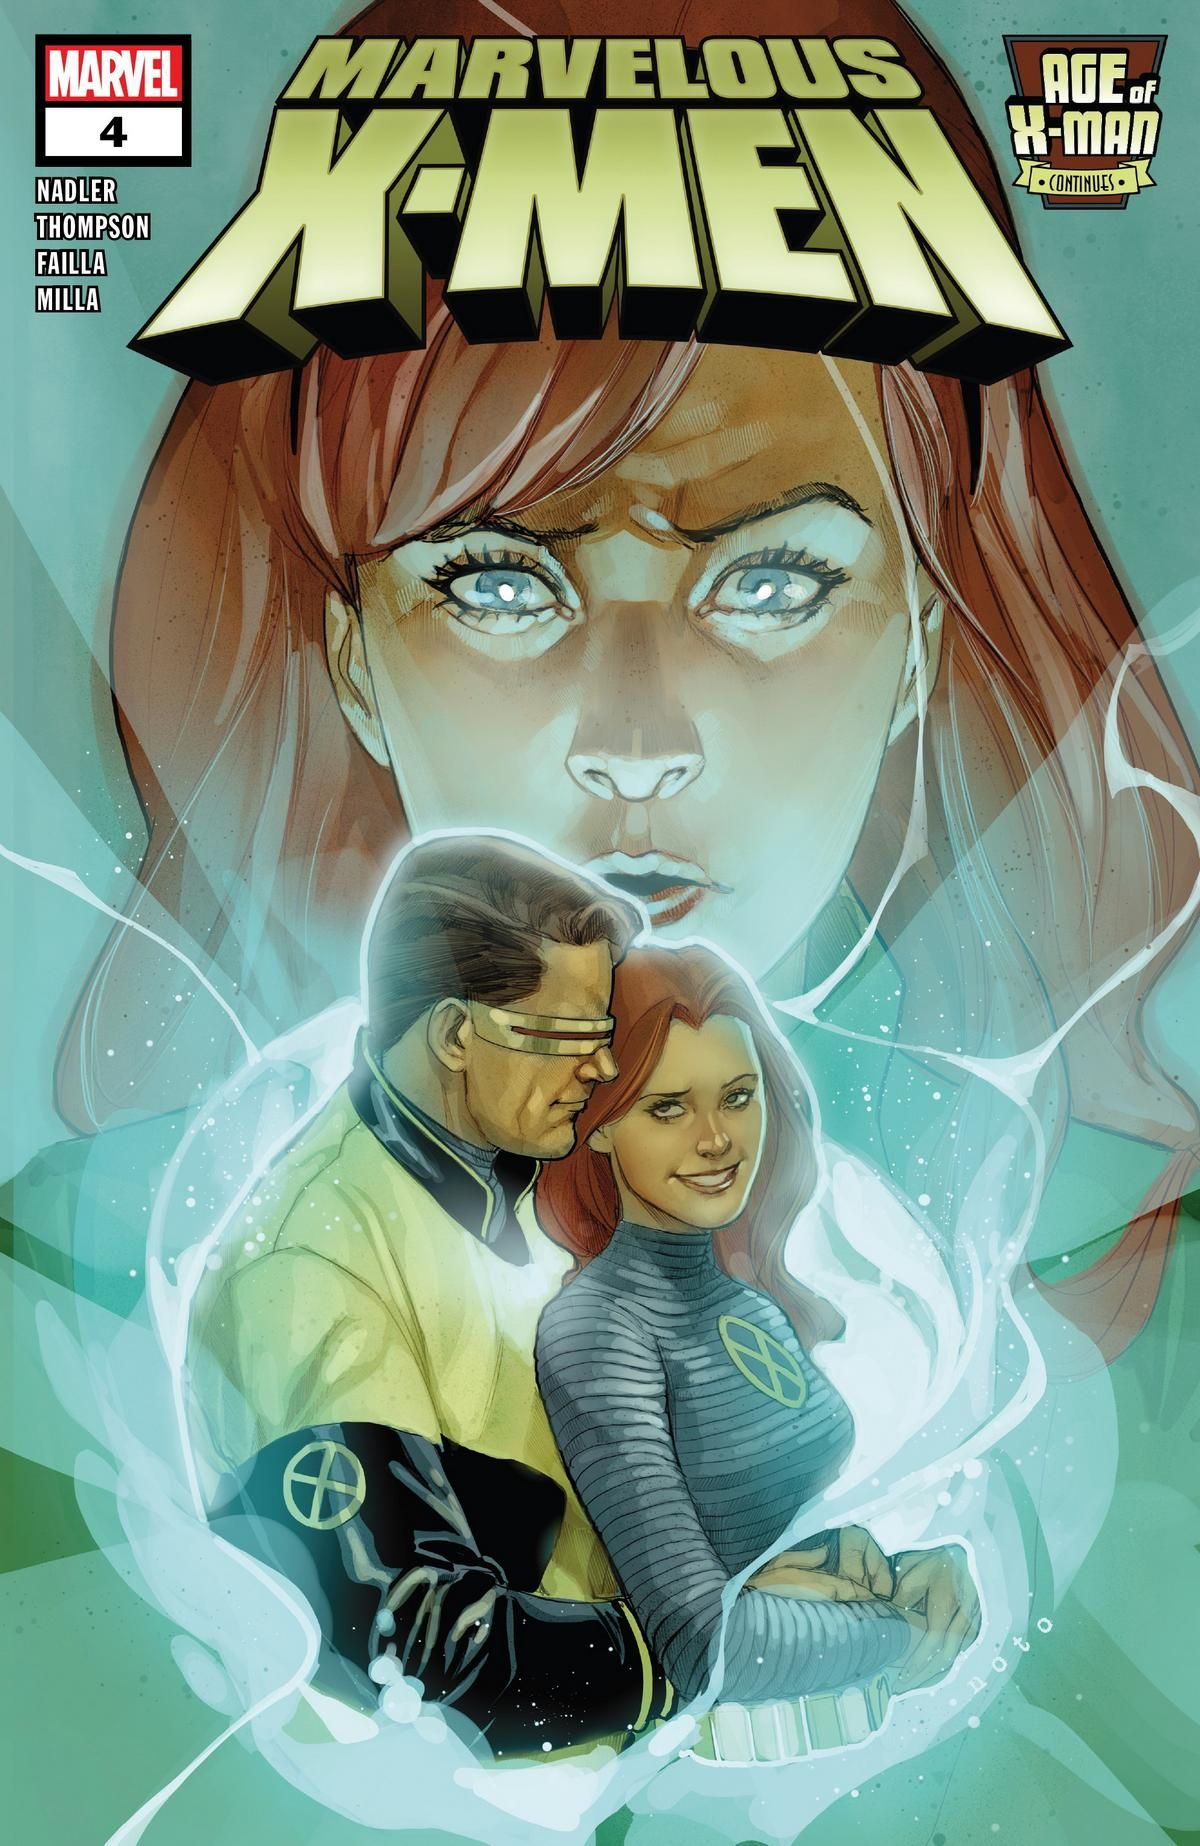 Age Of X Man The Marvelous X Men 2019 Chapter 4 Marvel Comics X Men Marvel